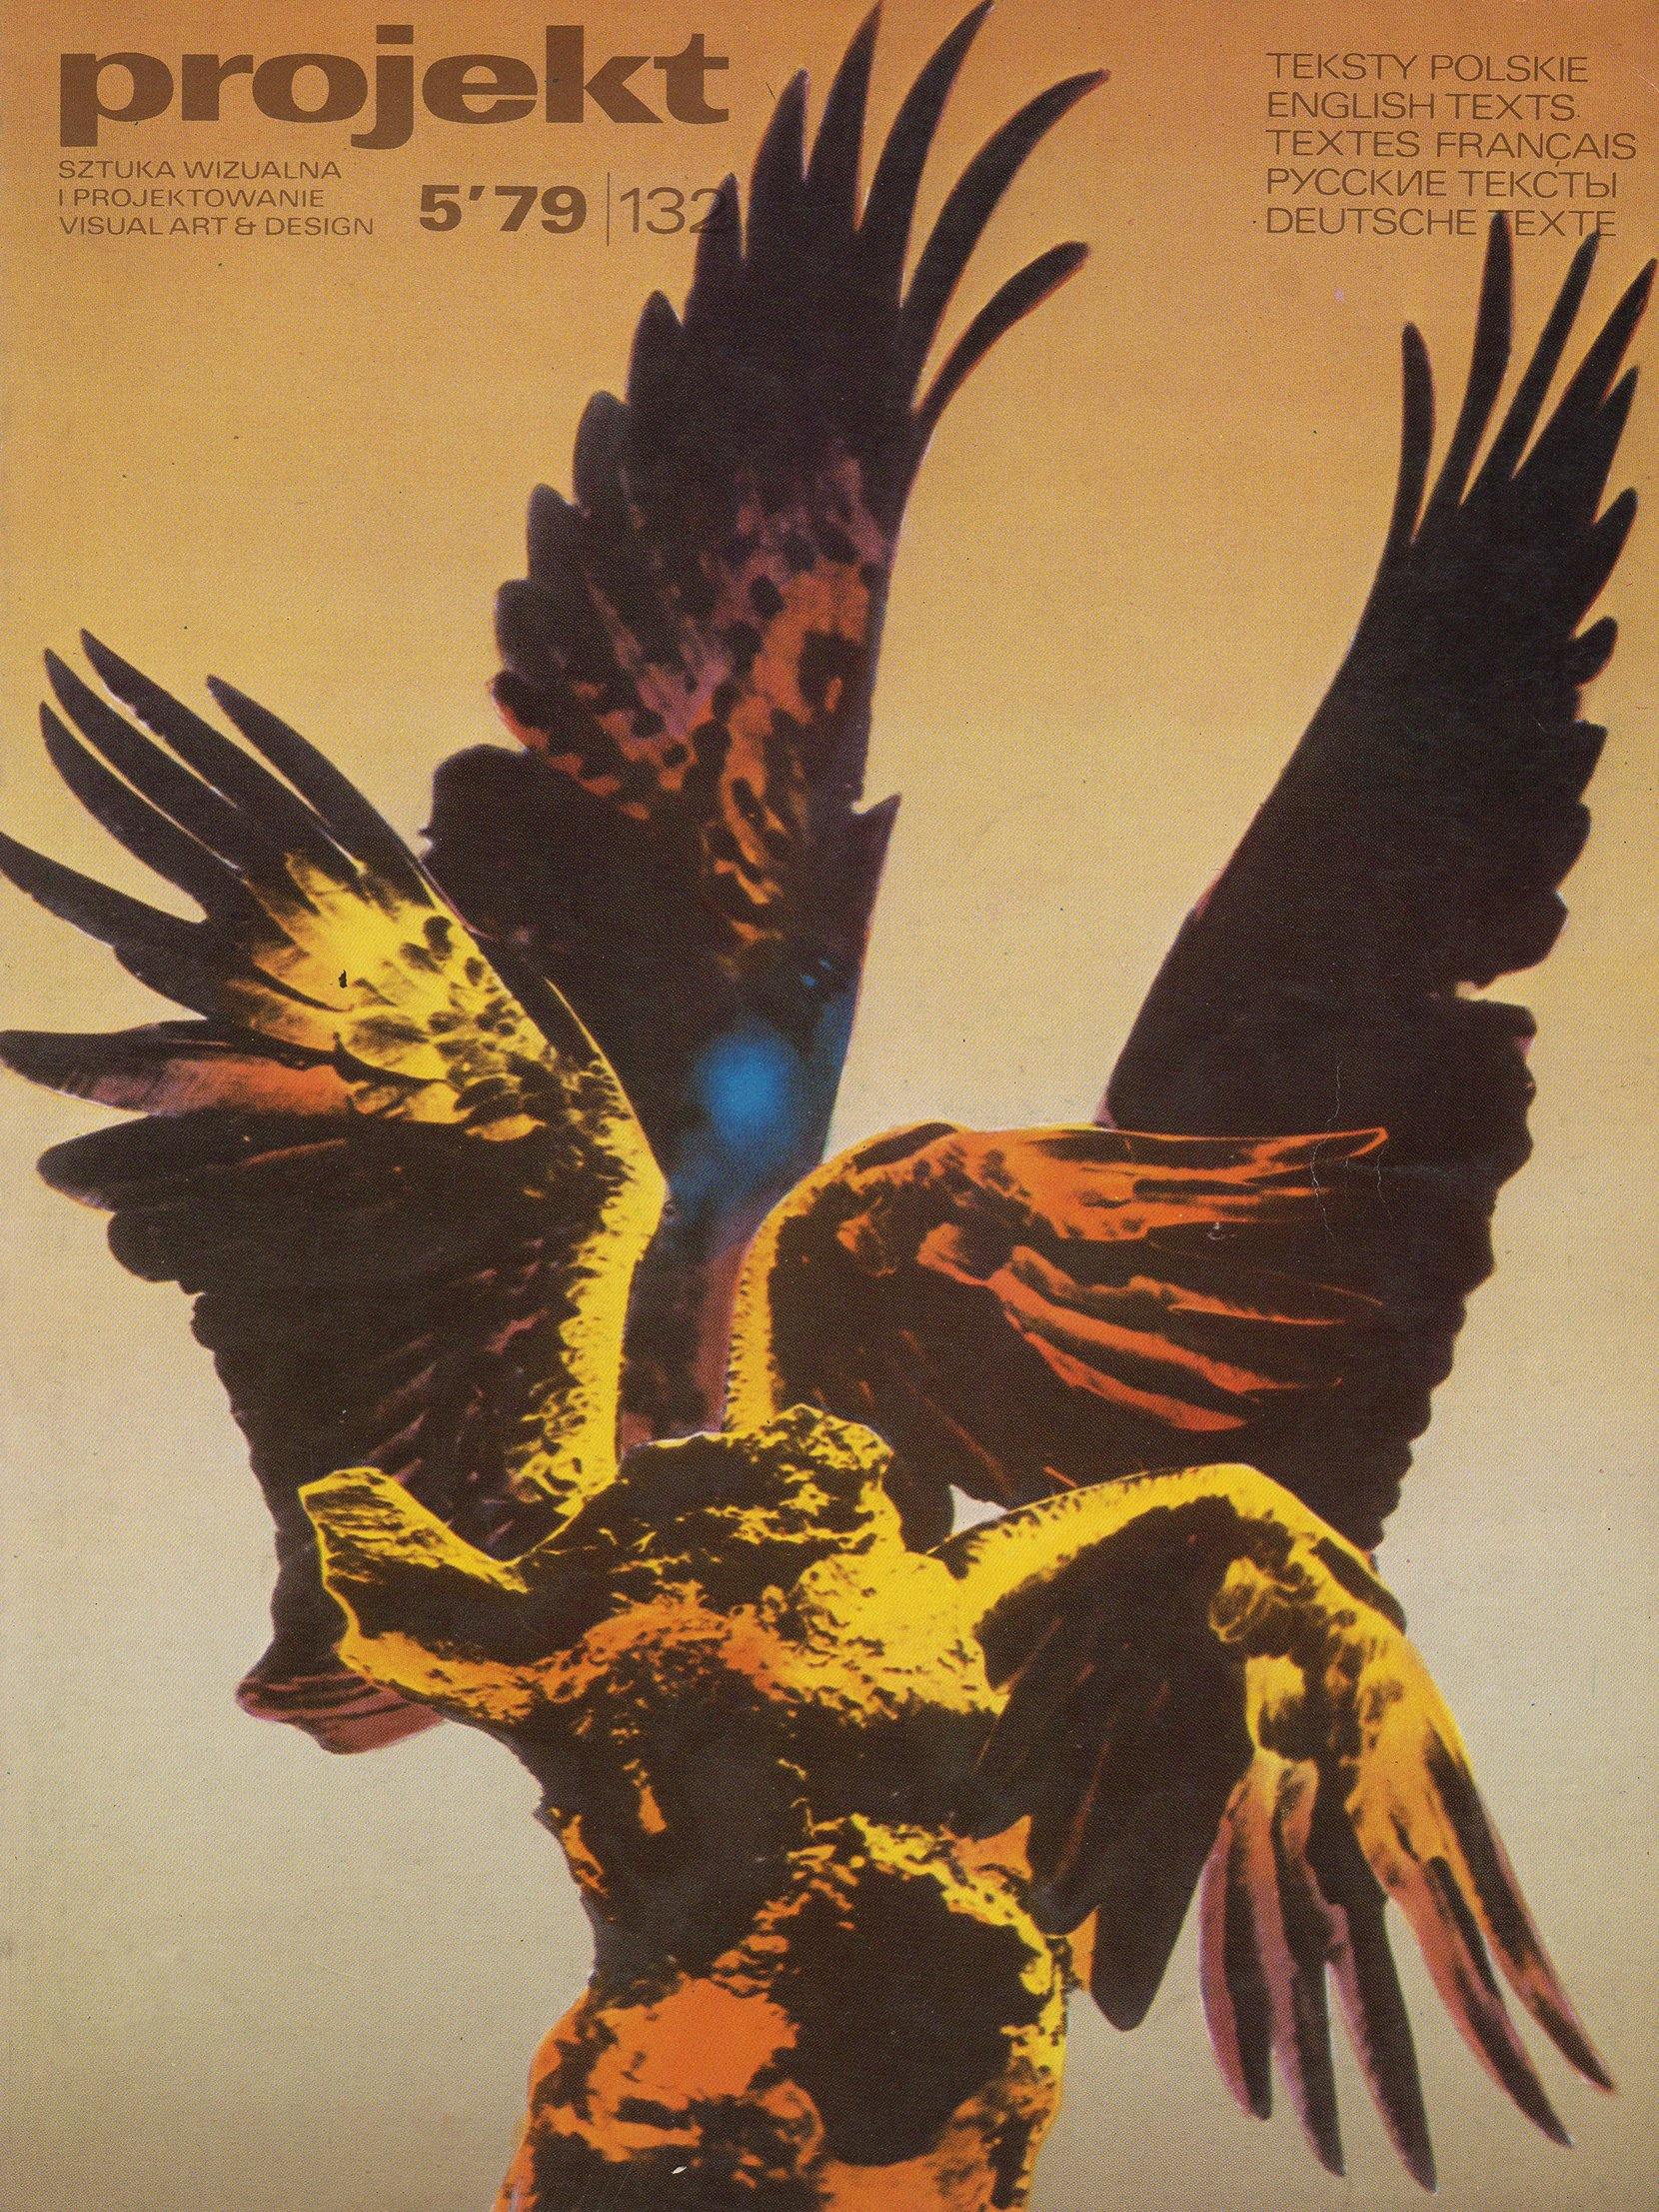 """projekt"" magazine, 1979-5 periodicals art & culture"